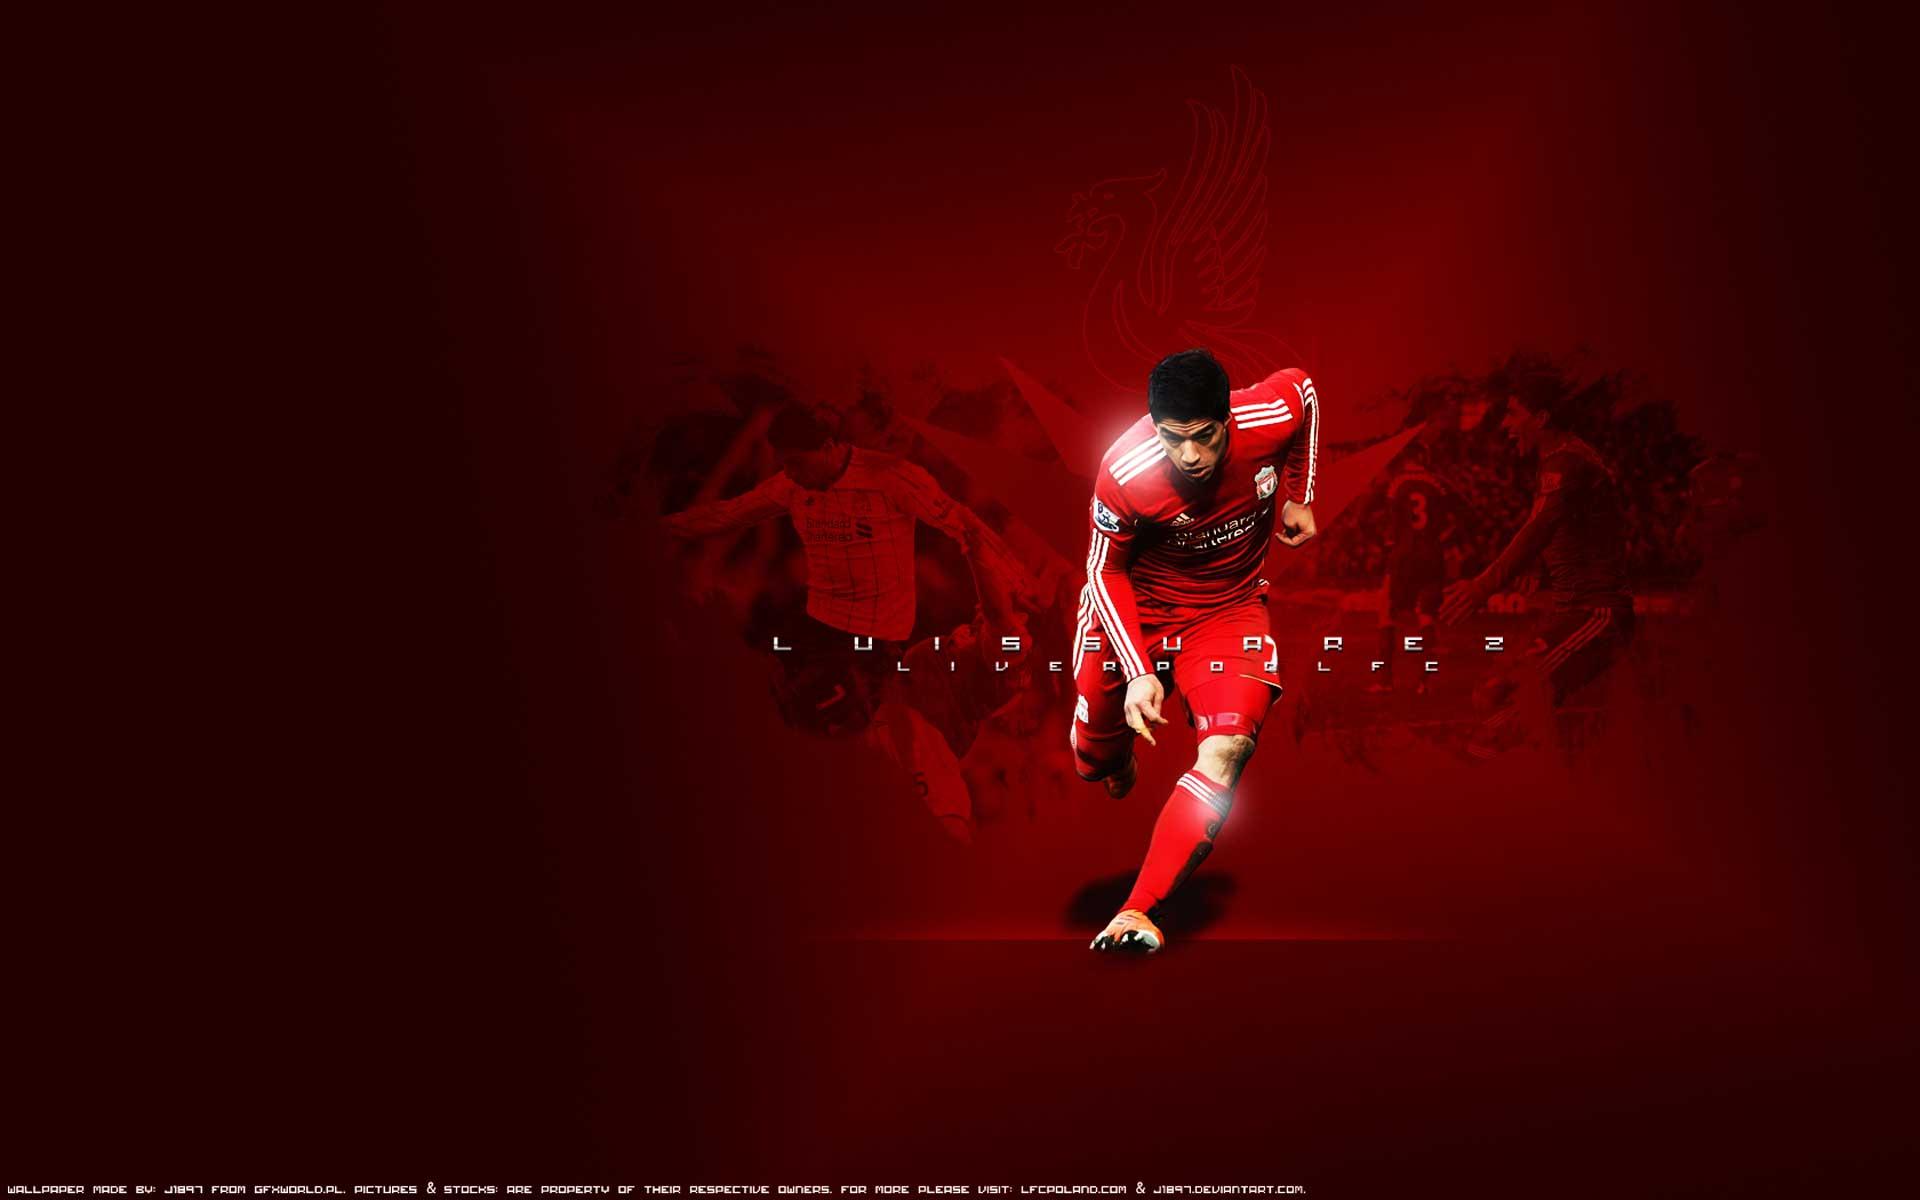 Luis Suarez 2014 Best Wallpaper   Football HD Wallpapers 1920x1200